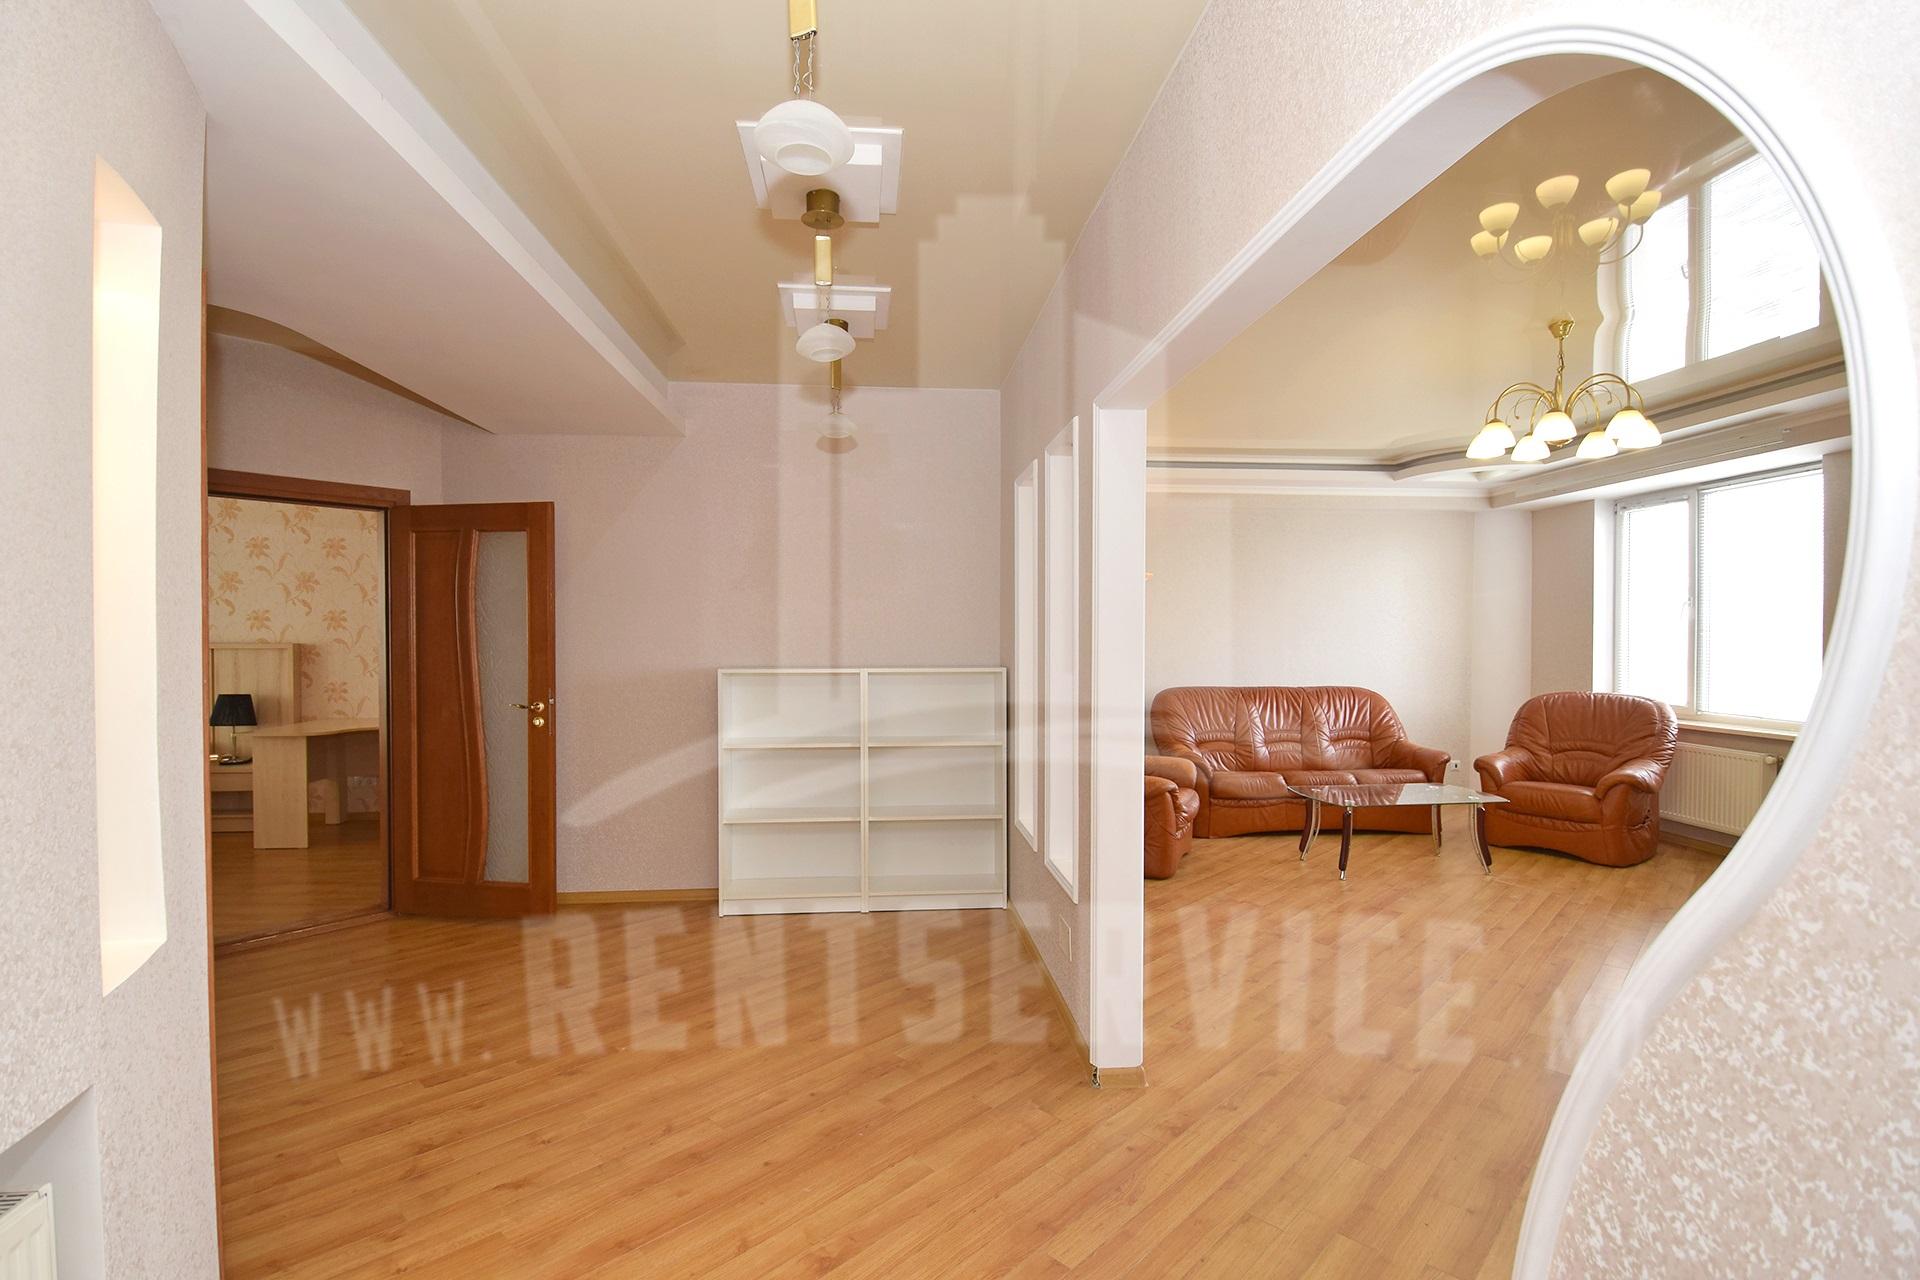 211_apartment_2.JPG